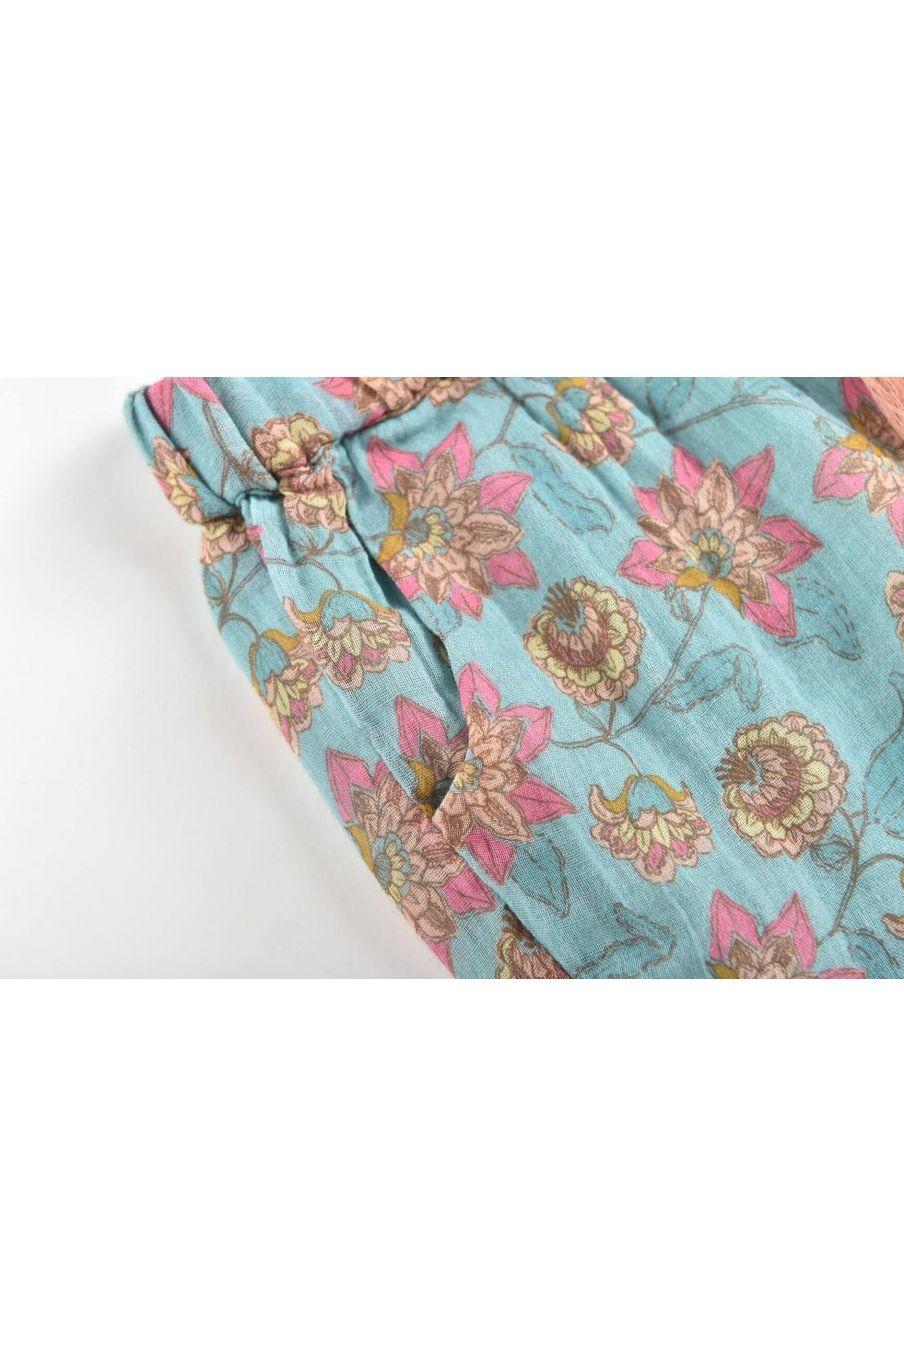 boheme chic vintage short fille vallaloid turquoise flowers